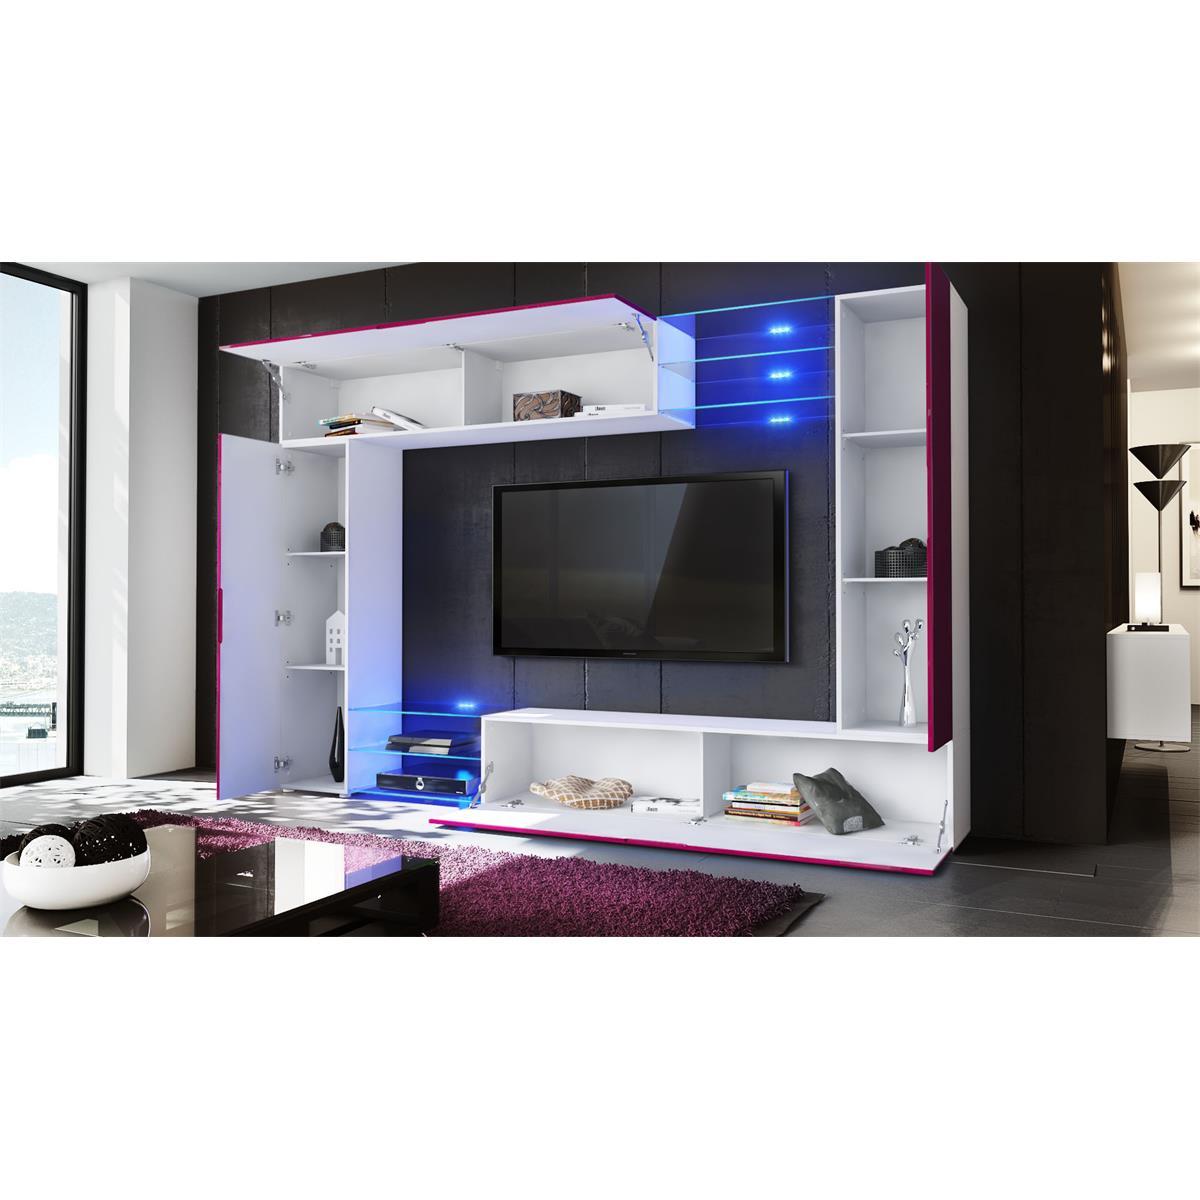 mirage wohnwand in moderner rahmenoptik mit led beleuchtung. Black Bedroom Furniture Sets. Home Design Ideas